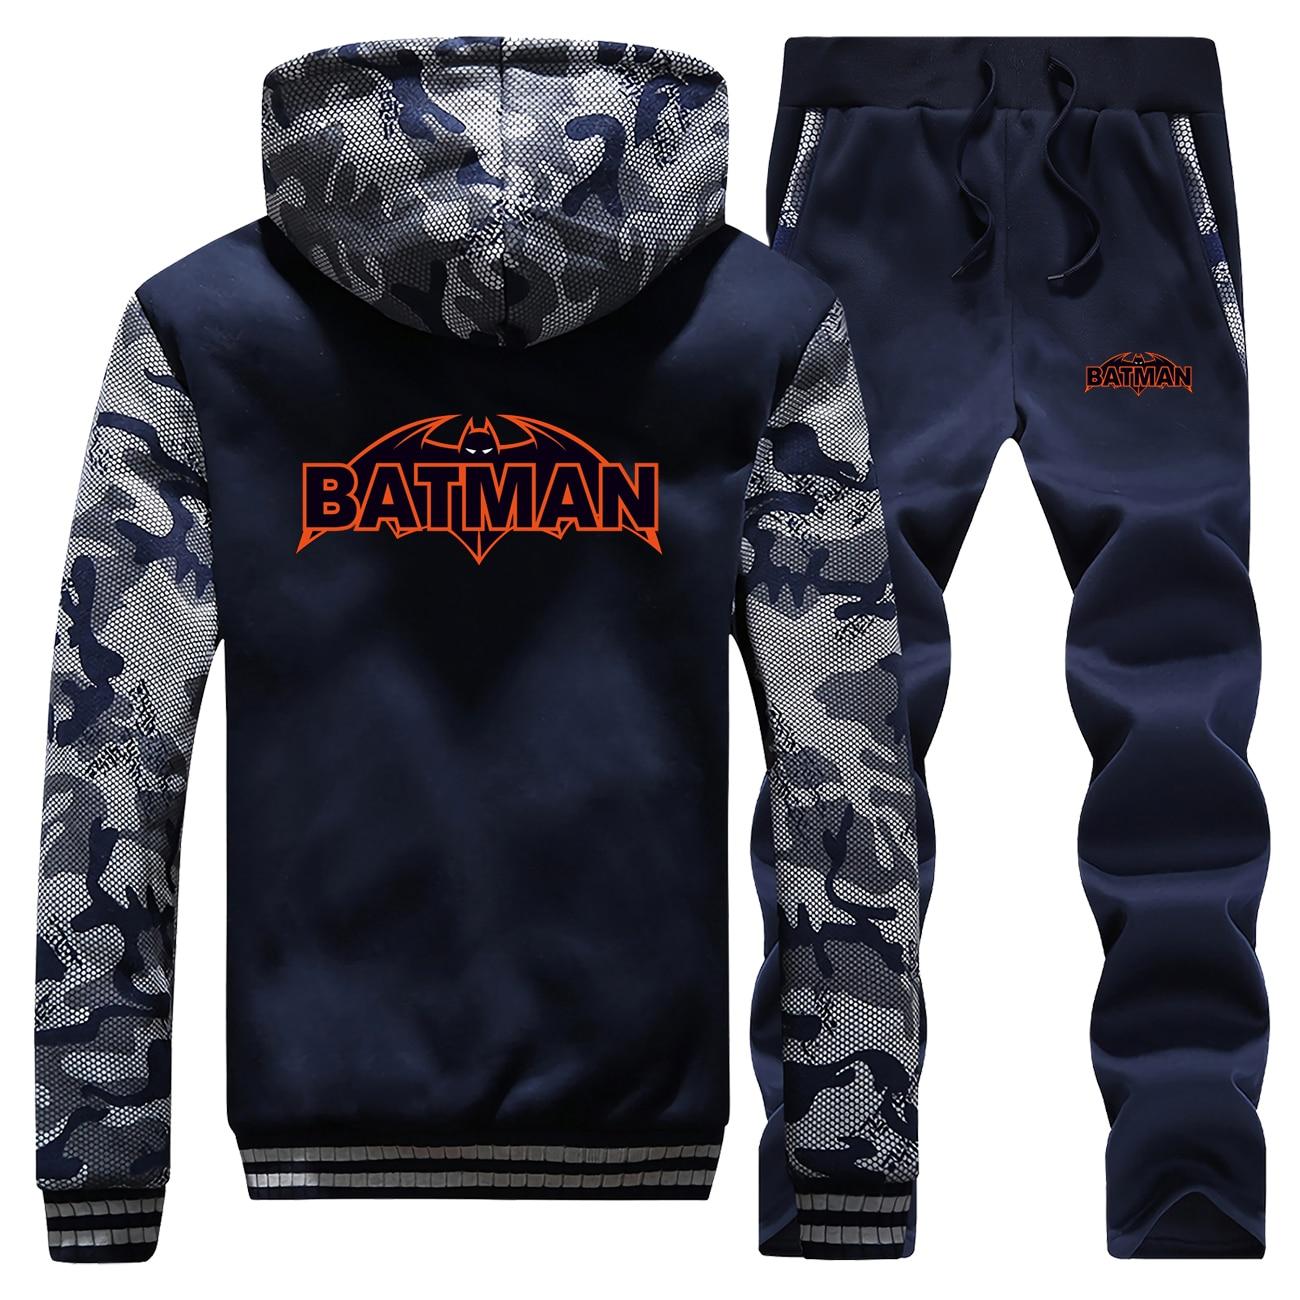 Batman Superhero Winter 2019 Camouflage Casual Mens Hoodies Coat Thick Suit Fashion Warm Jackets Sportswear+Pants 2 Piece Set